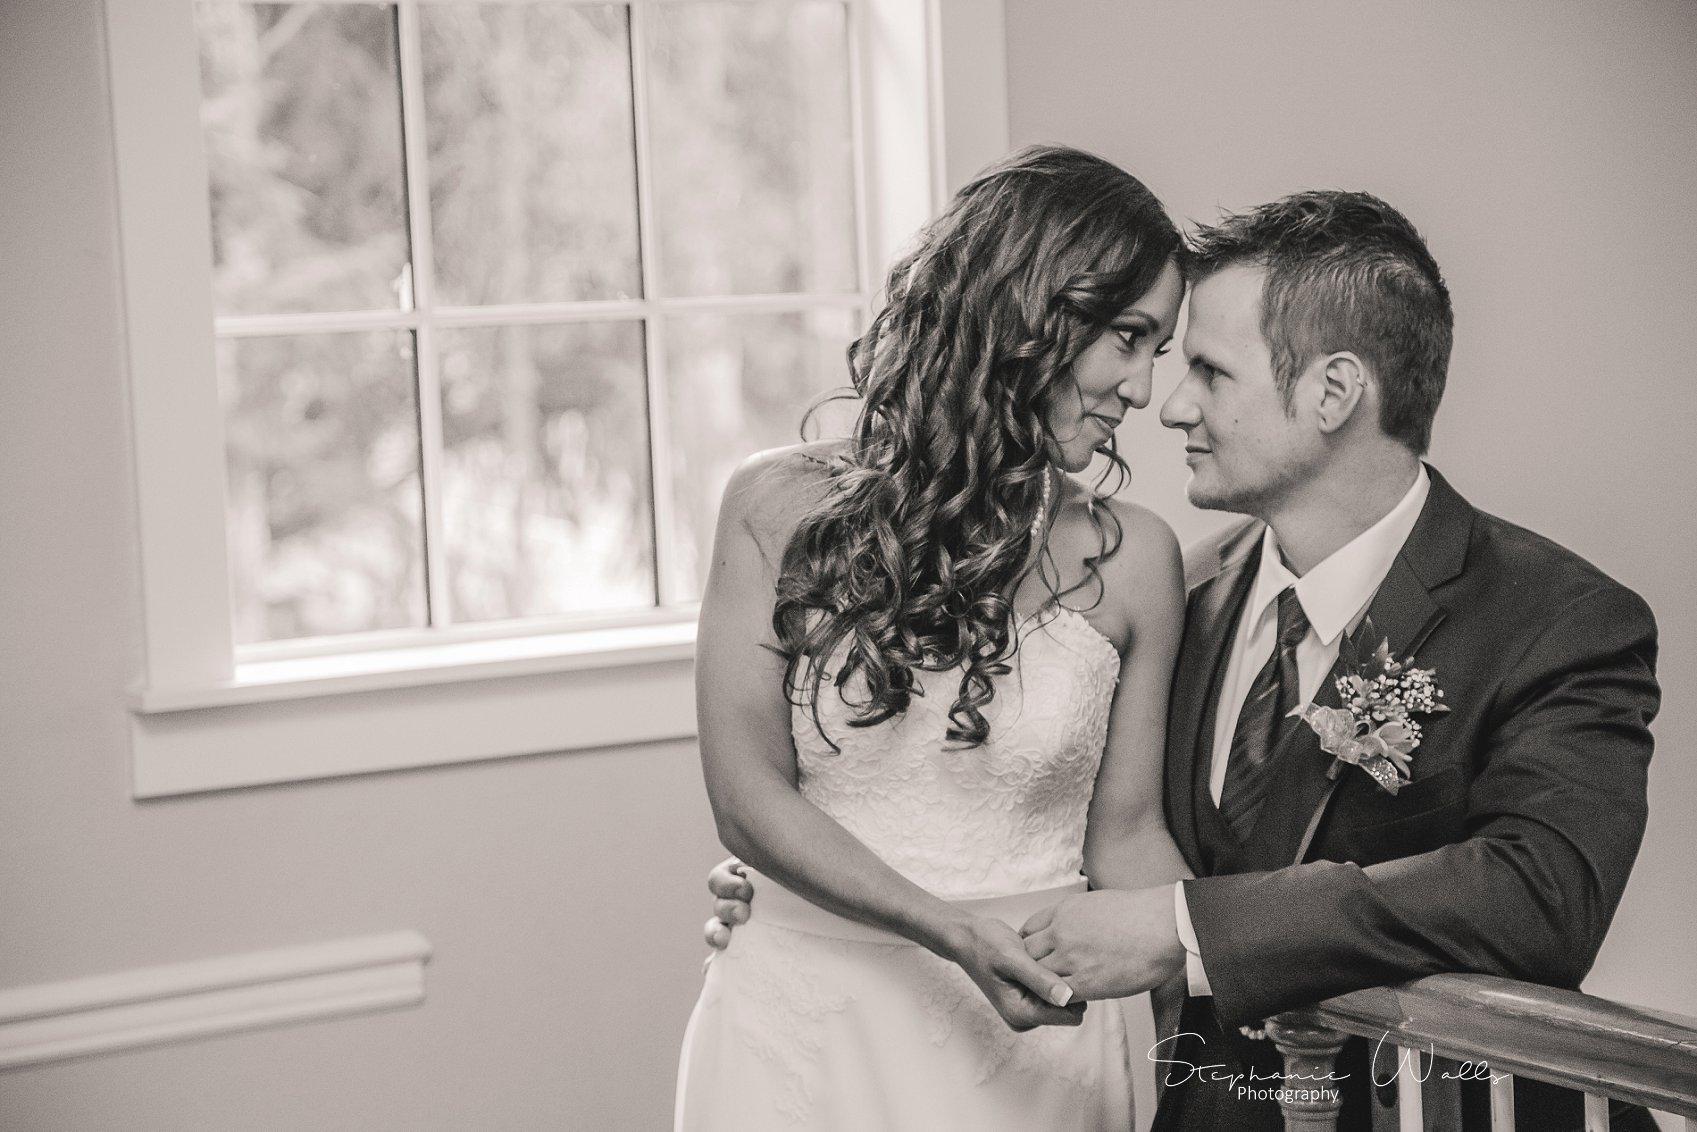 1st look Bridals 090 KK & Zack | Hollywood Schoolhouse Wedding | Woodinville, Wa Wedding Photographer